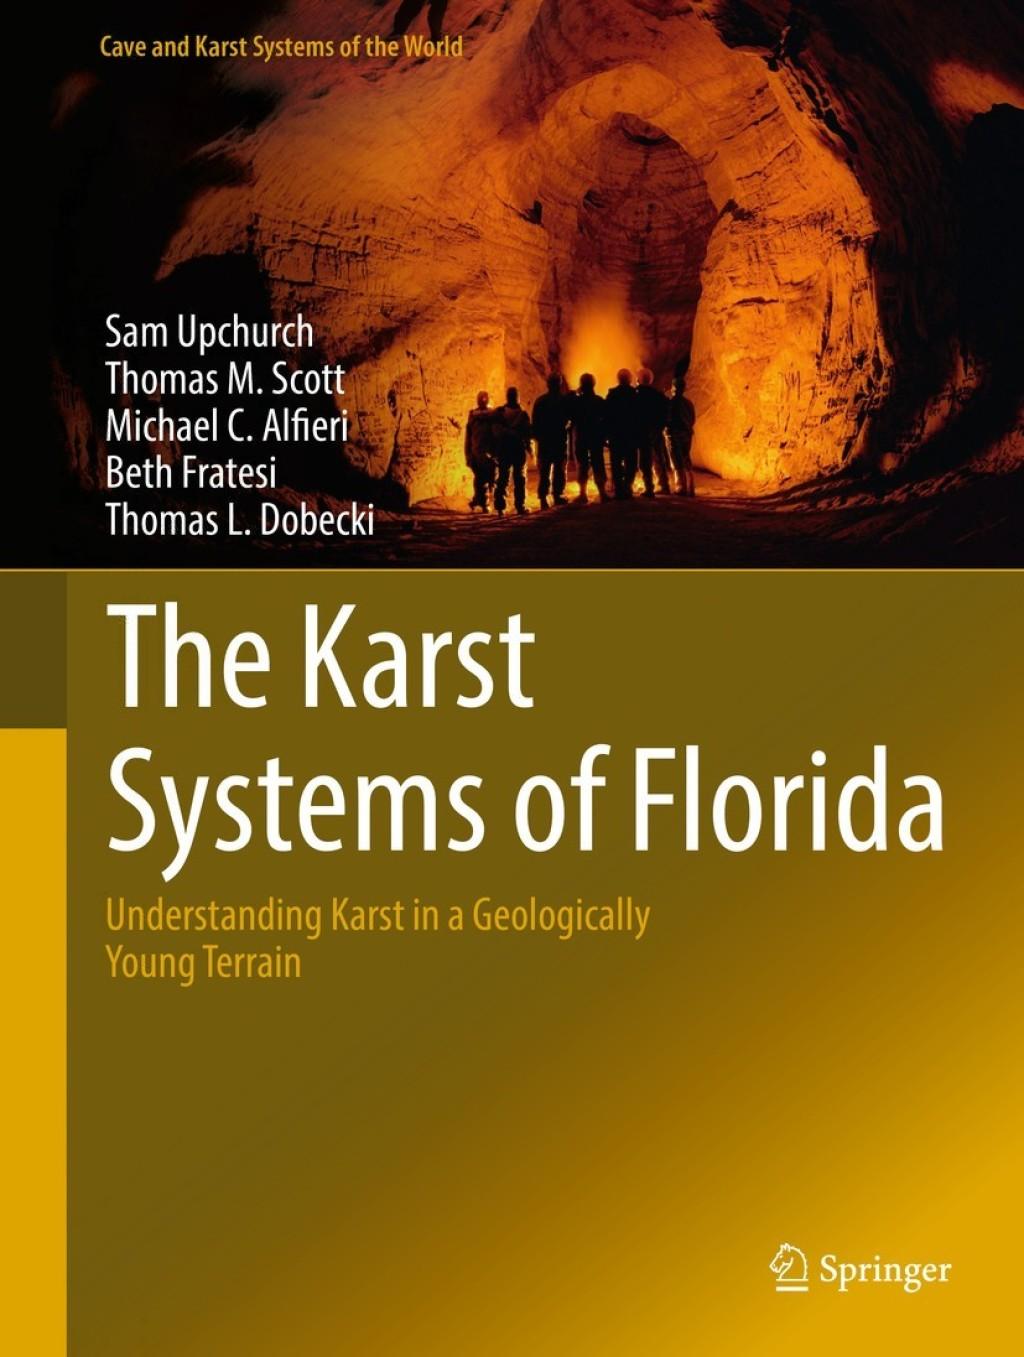 The Karst Systems of Florida (eBook) - Sam Upchurch; Thomas M. Scott; MICHAEL ALFIERI; Beth Fratesi; Thomas L. Dobecki